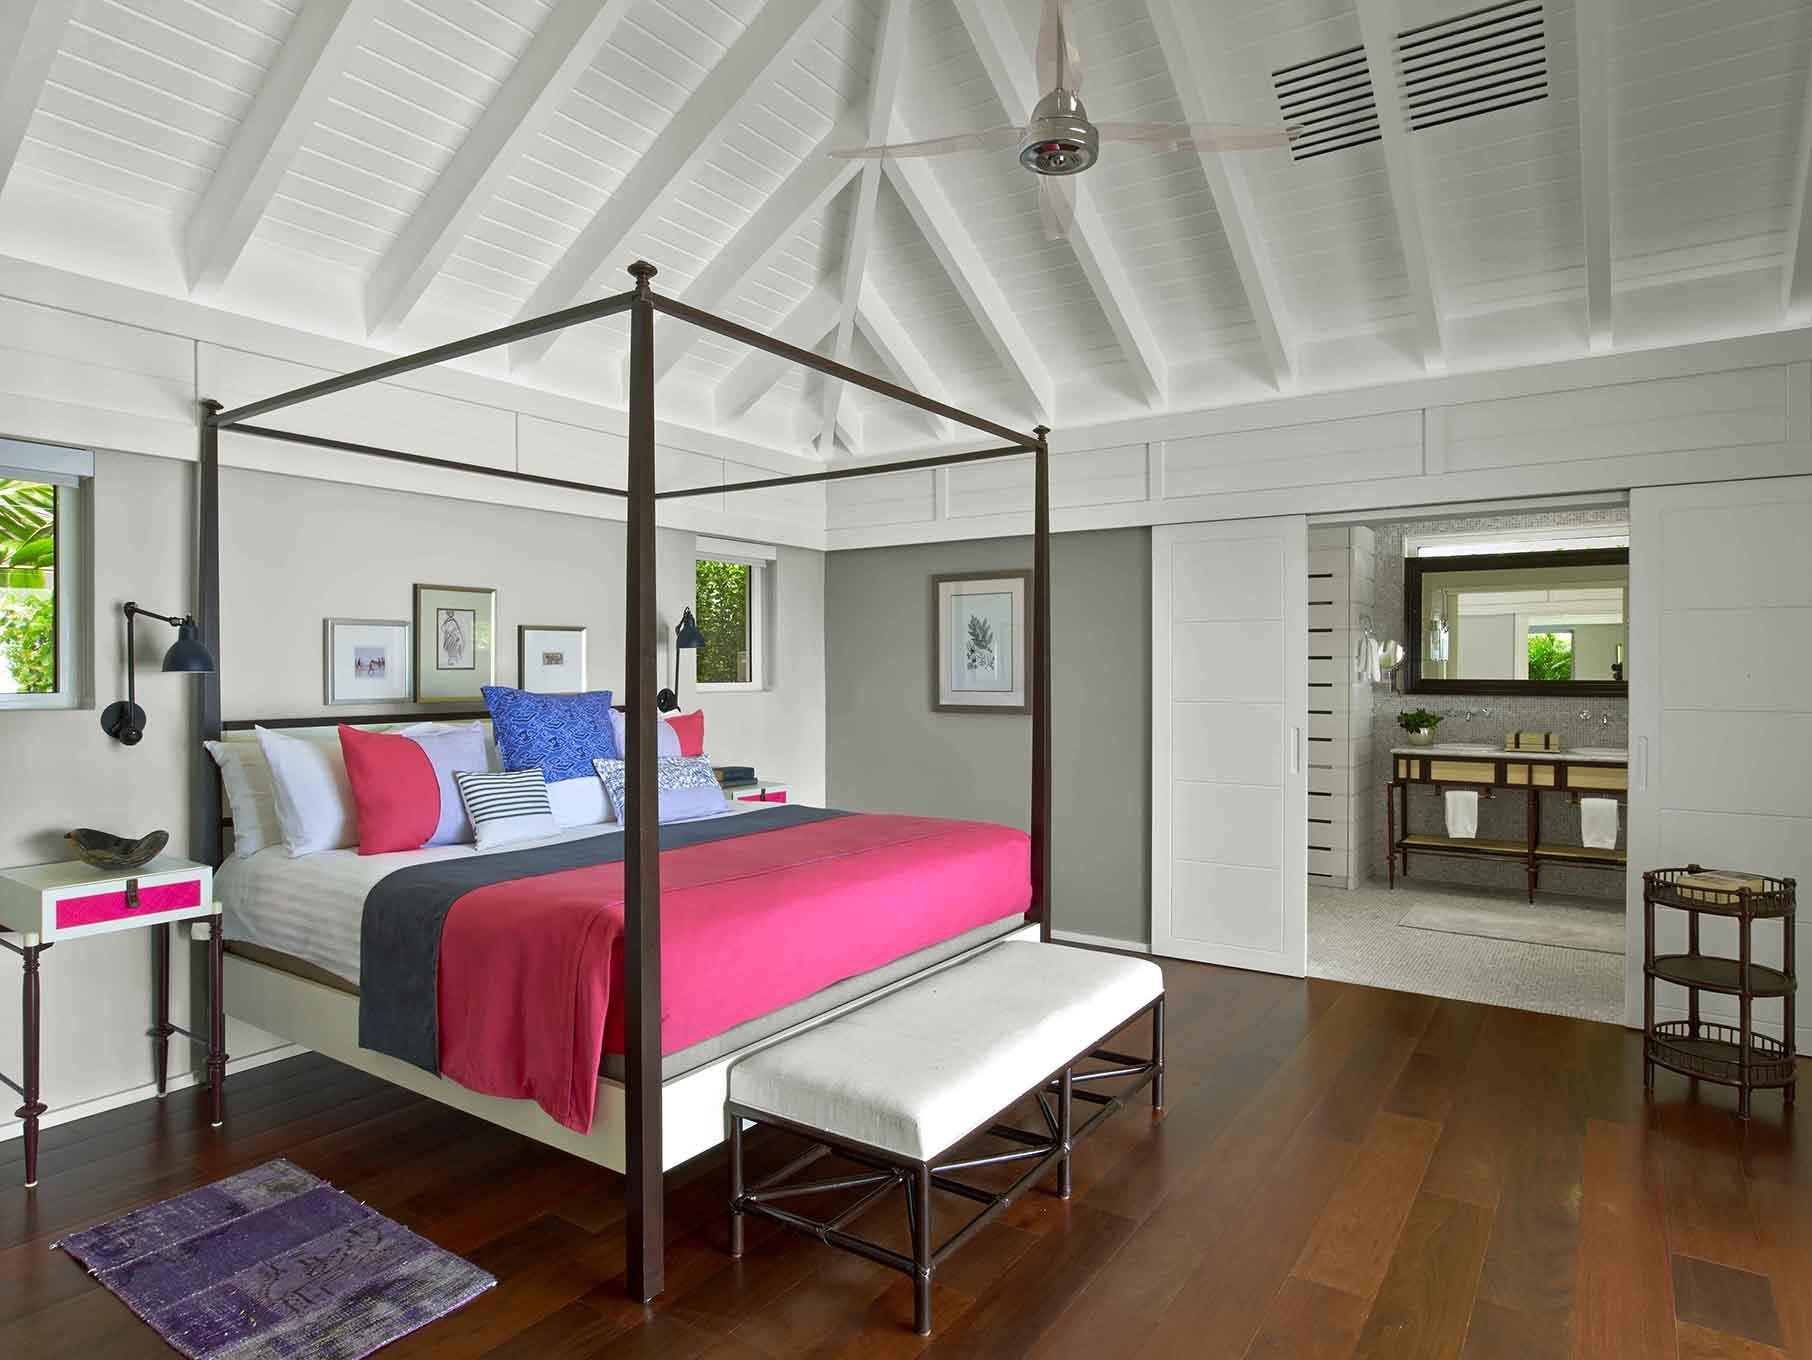 luis-pons-design-interior-tropical-hotel-stbarths_17.jpg